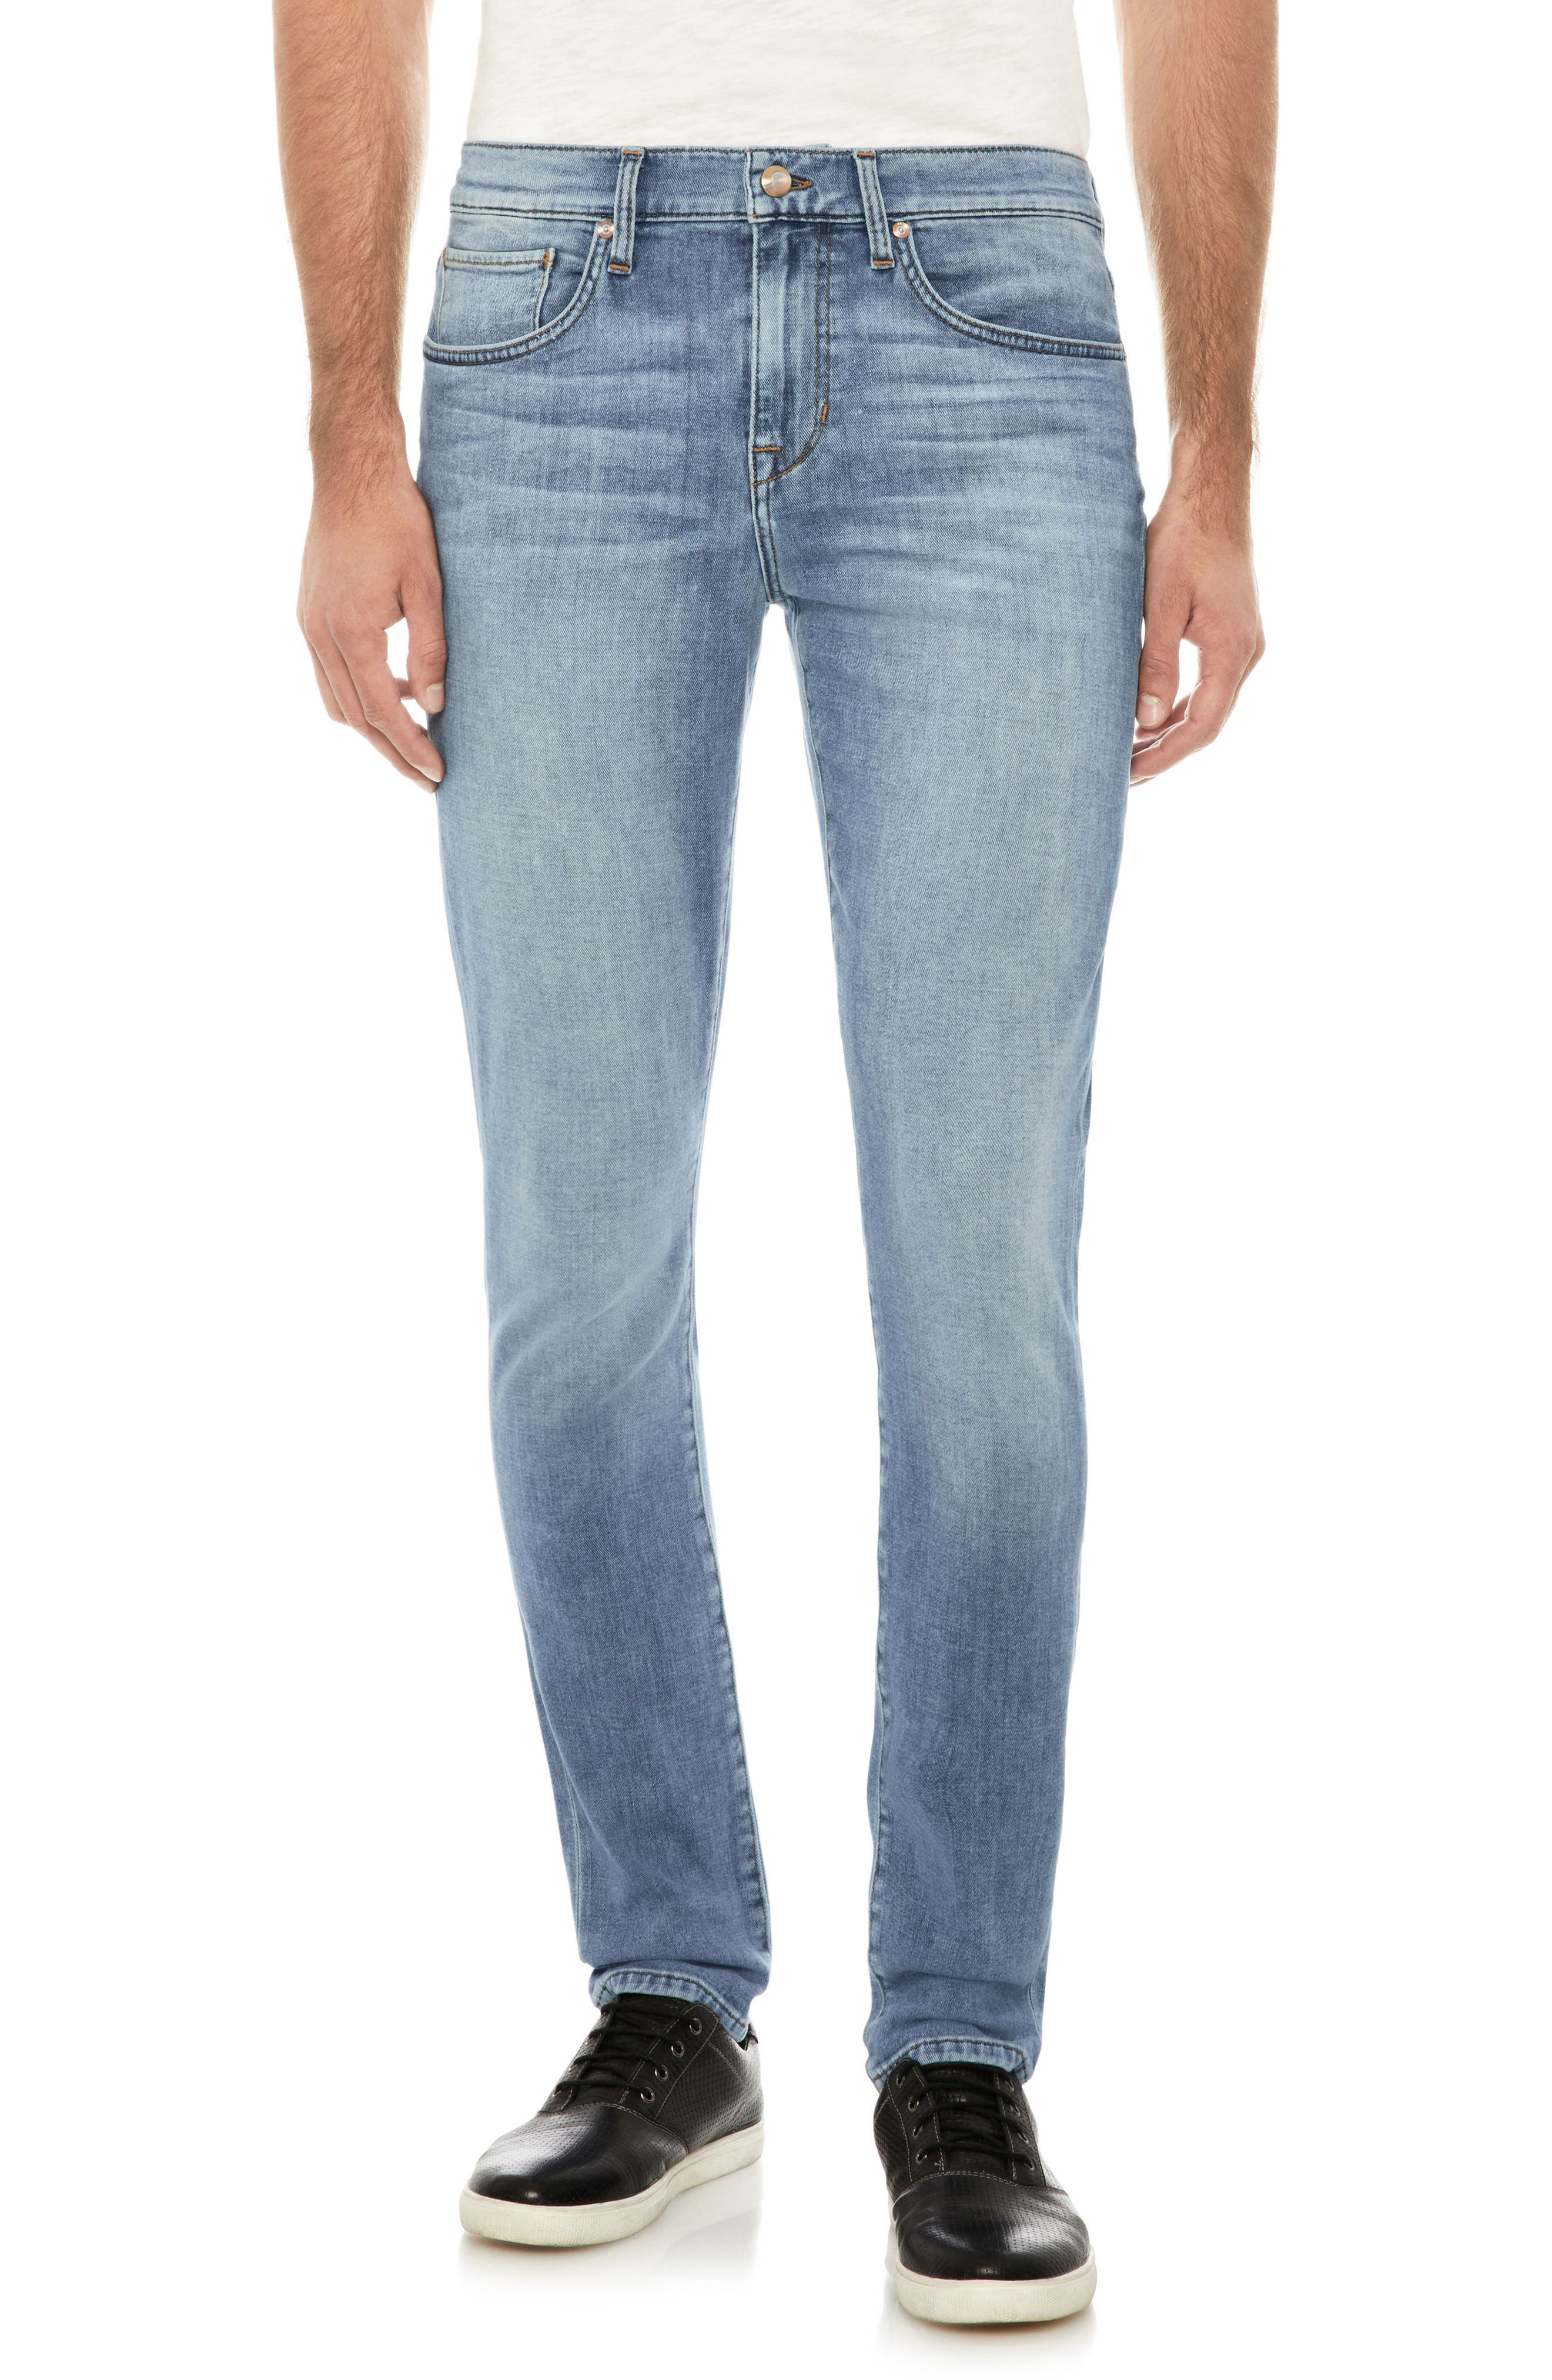 Legend Skinny Fit Jeans,                         Main,                         color, 451